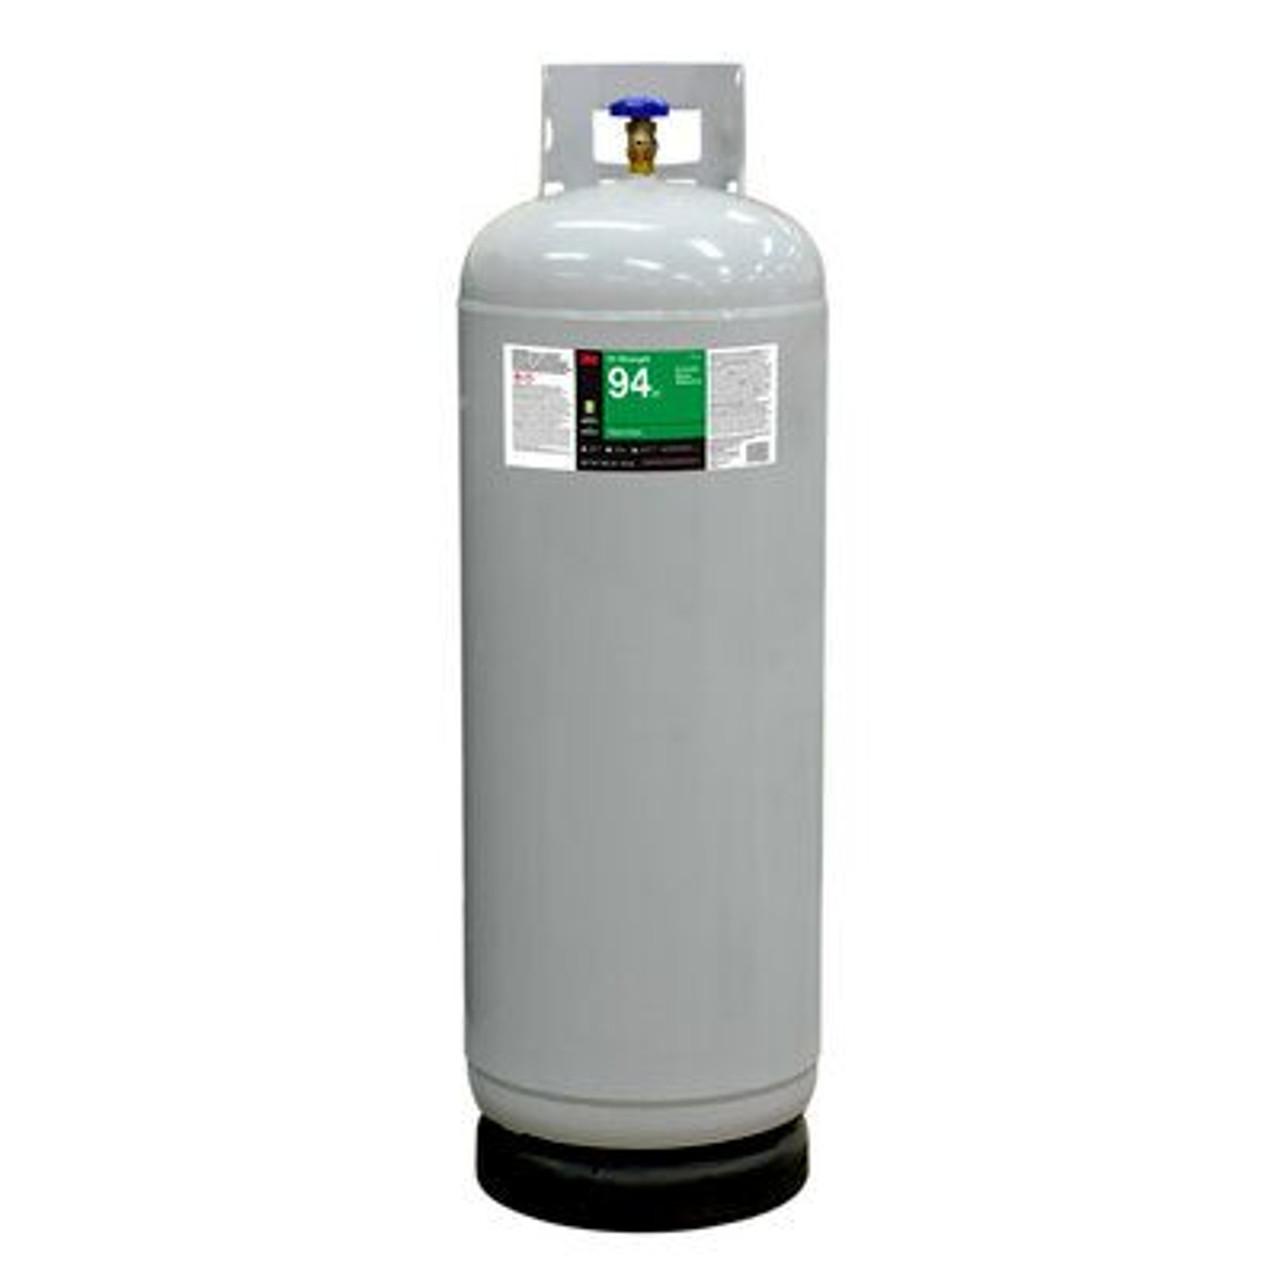 3M™ Hi-Strength 94 ET Cylinder Spray Adhesive, Clear, Intermediate Cylinder (Net Wt 128 lb)